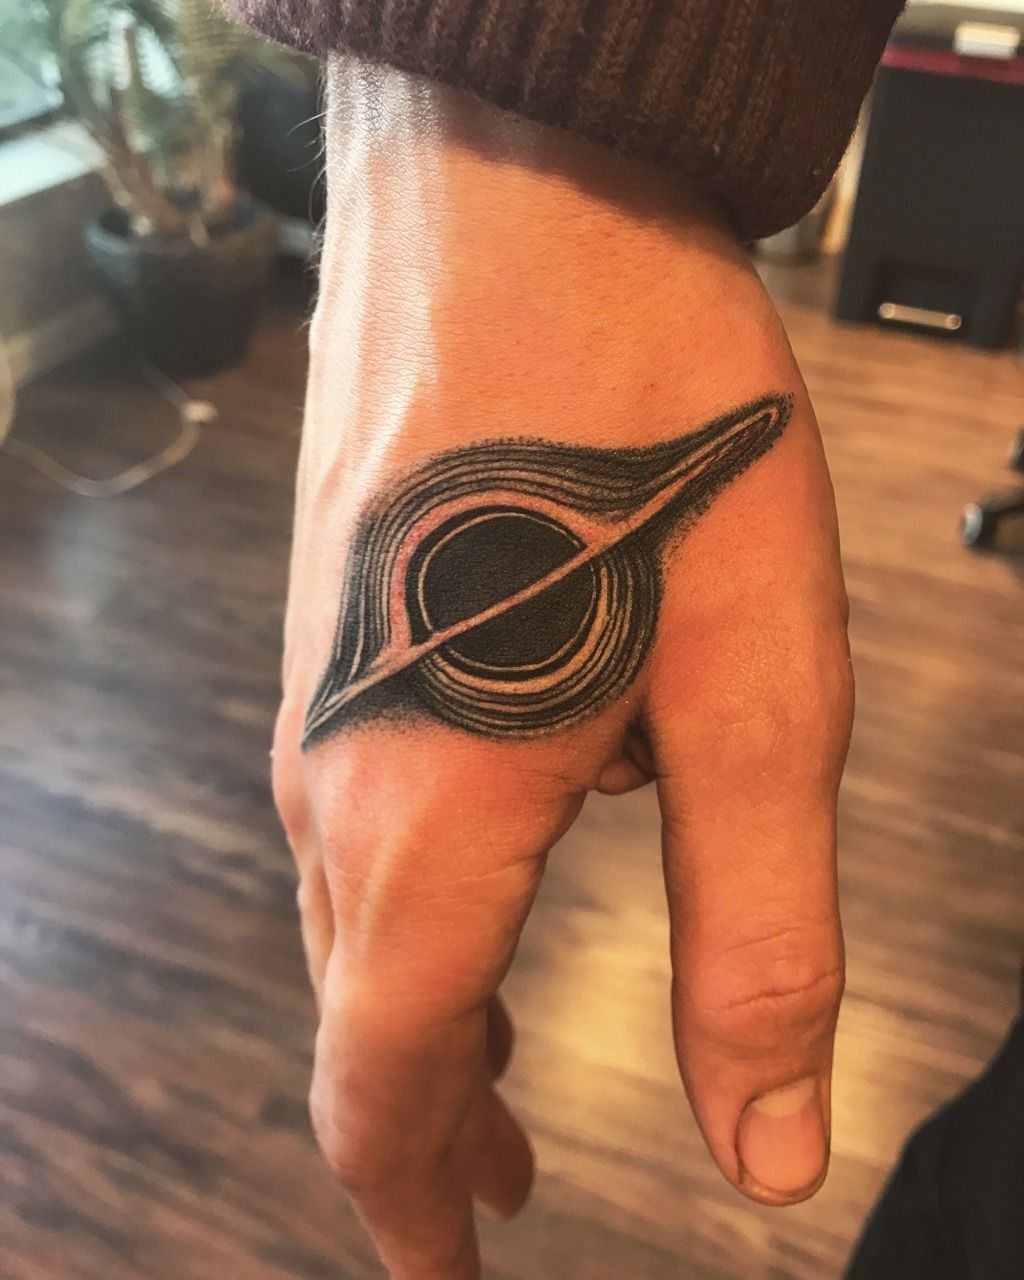 Eastern Pass Tattoo : eastern, tattoo, Gargantua, Interstellar, Weylin, Traugott, Eastern, Tattoo., Philly,, Tatuagens, Científicas,, Ideias, Tatuagem,, Aleatórias